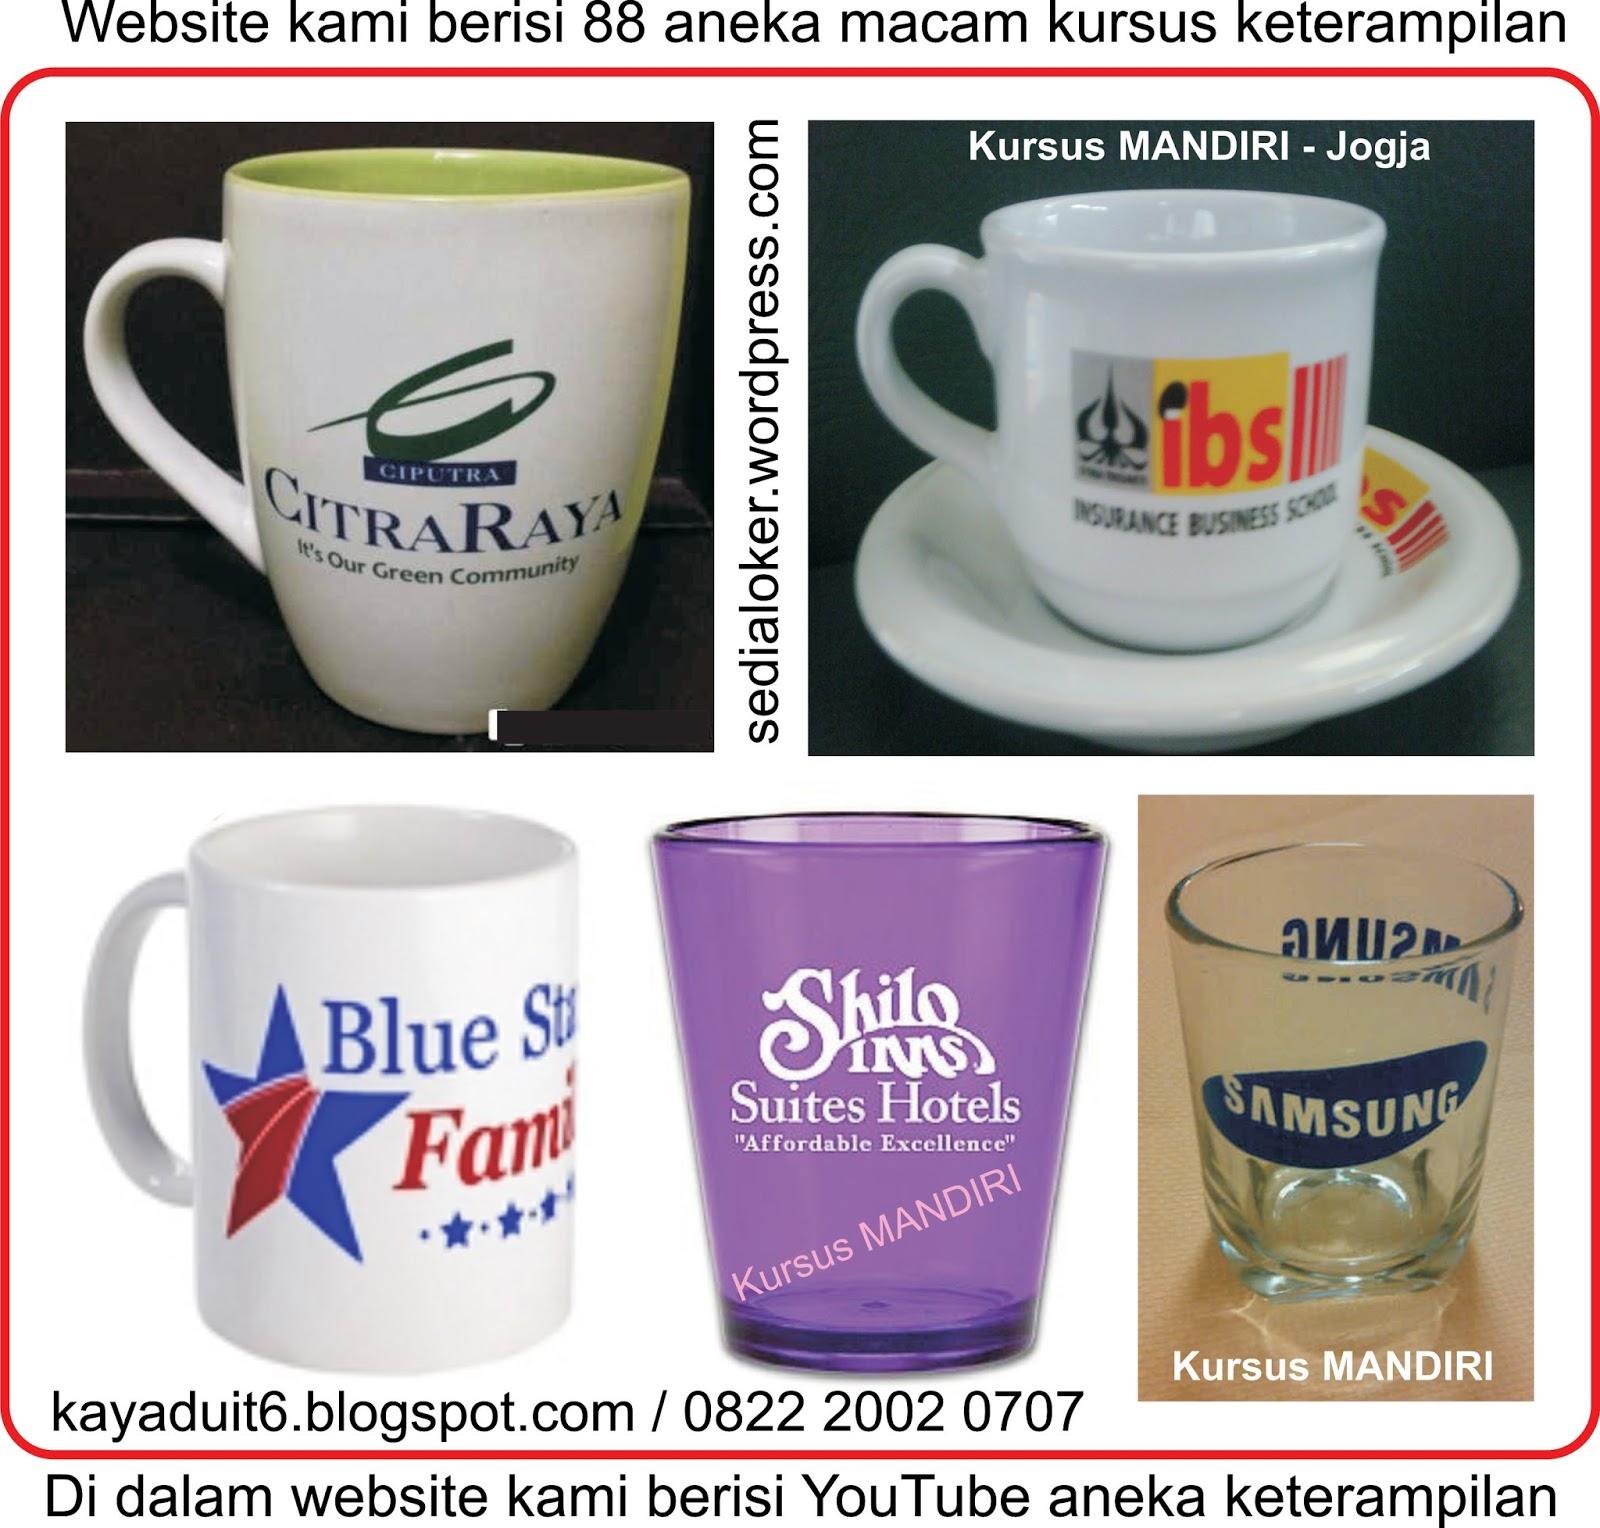 Perusahaan Baja Ringan Di Jakarta Etca, Etching, Grafika, Grafir, Engraving, Acrylic, Nama ...